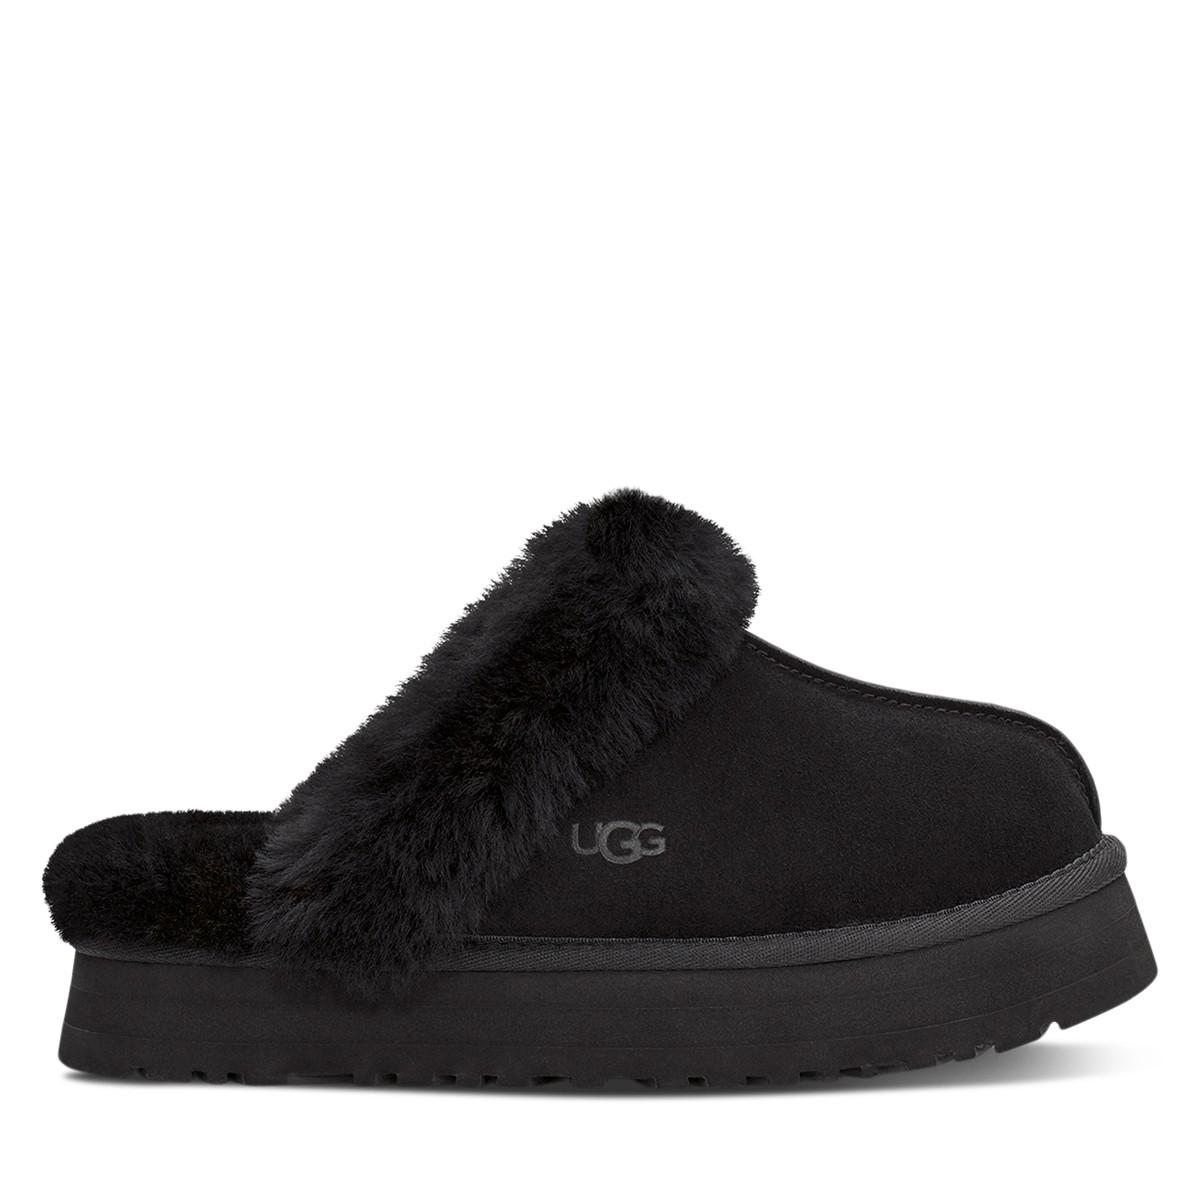 Women's Disquette Slippers in Black